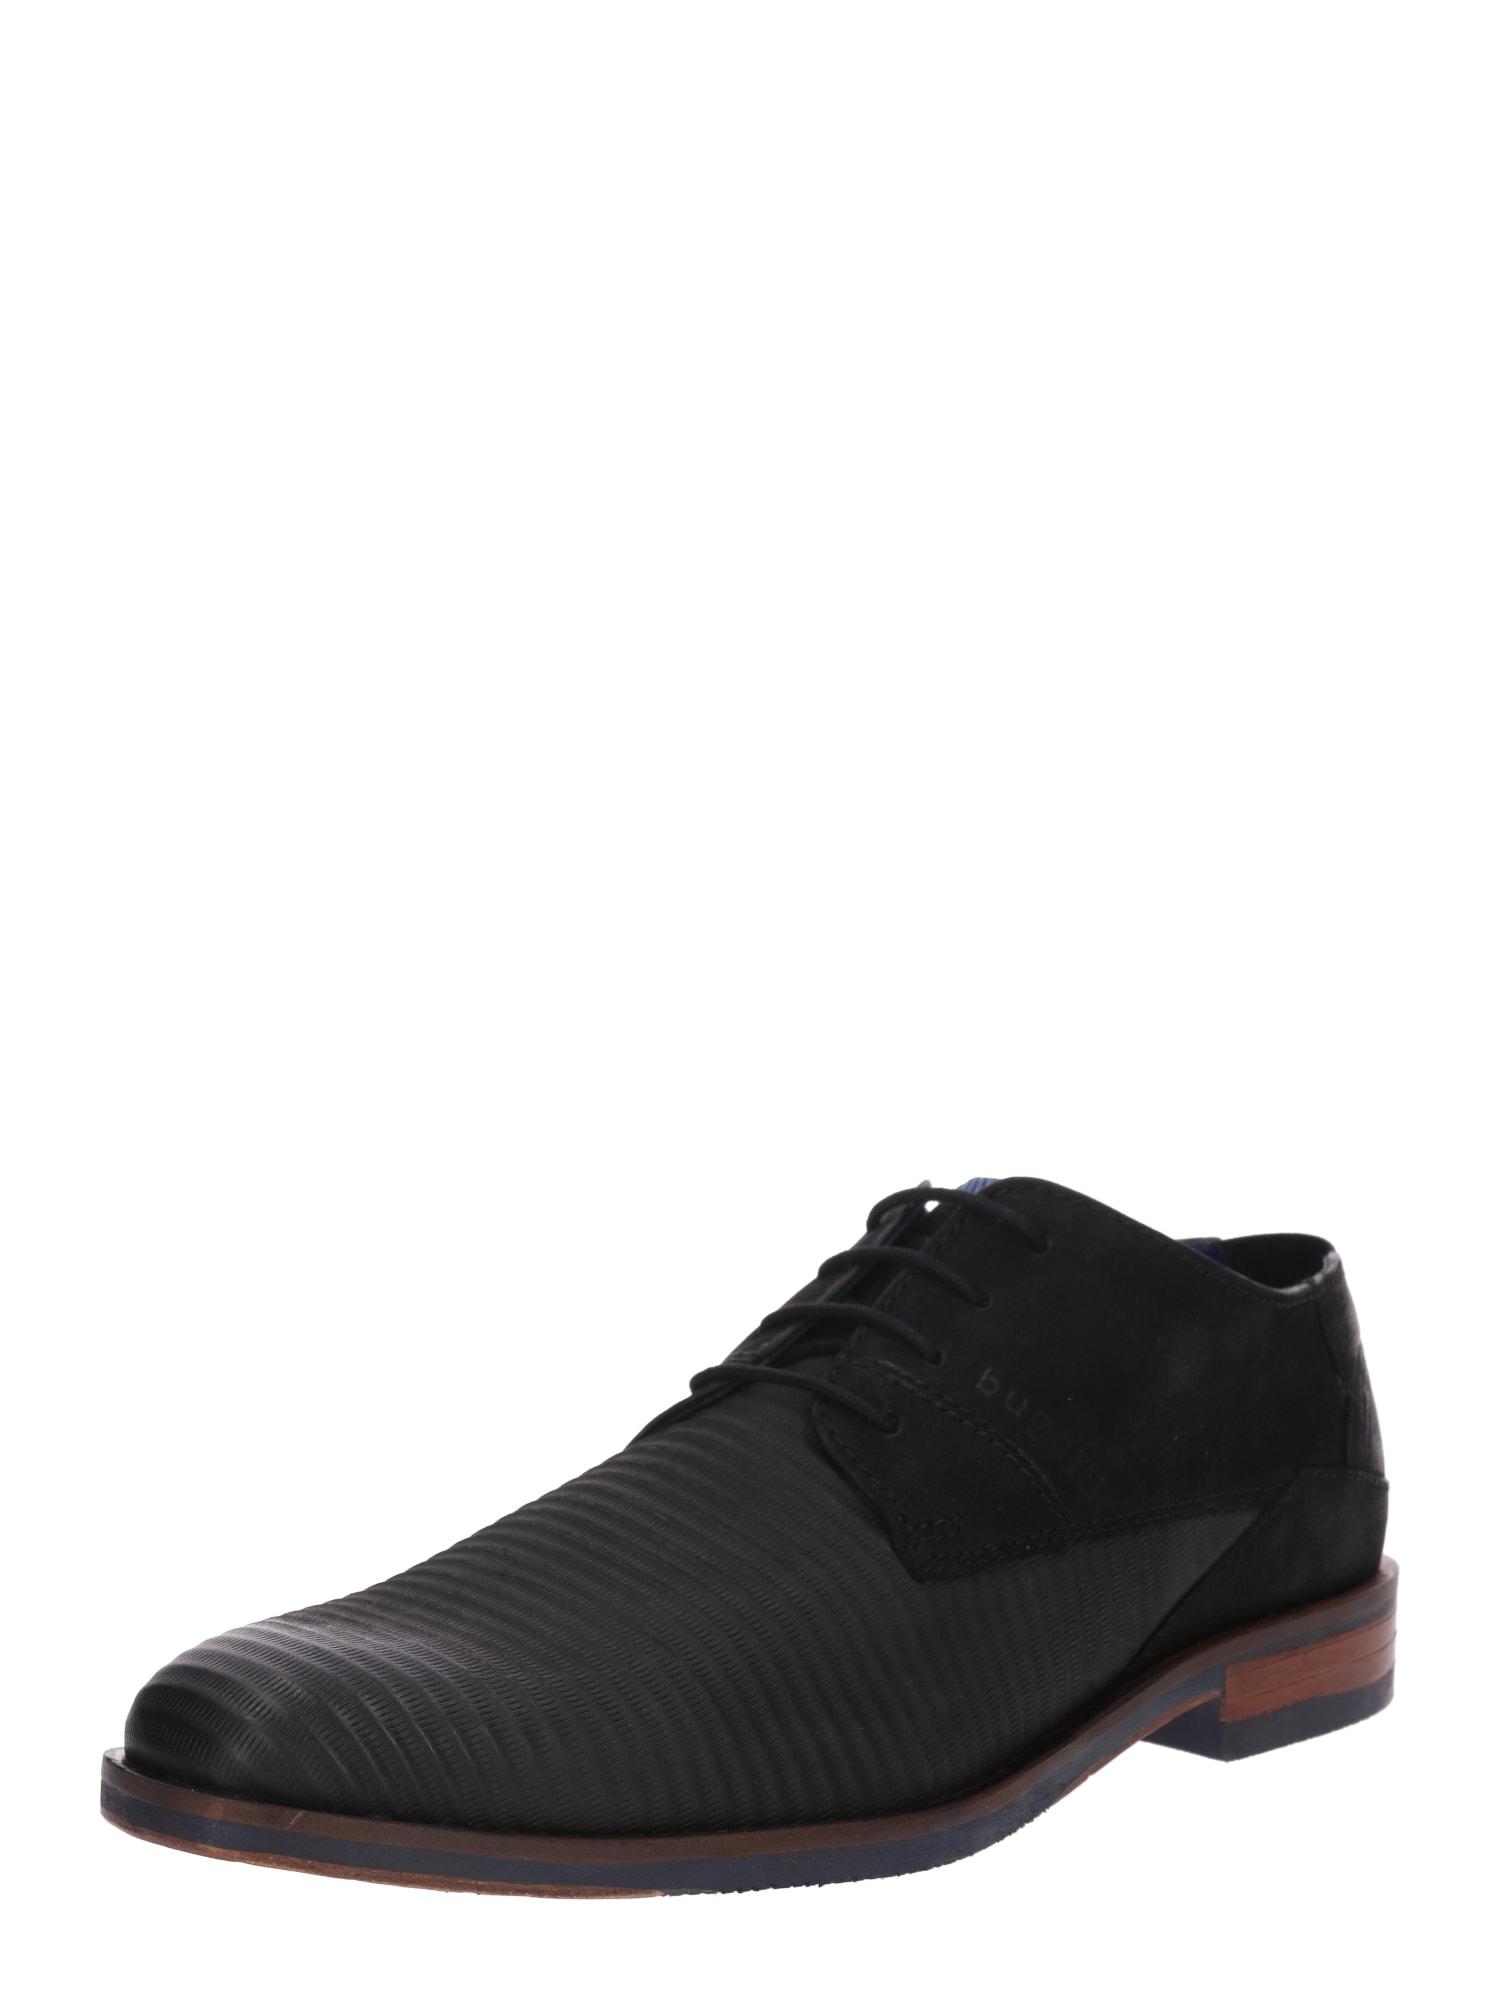 Šněrovací boty Rainel Evo černá Bugatti